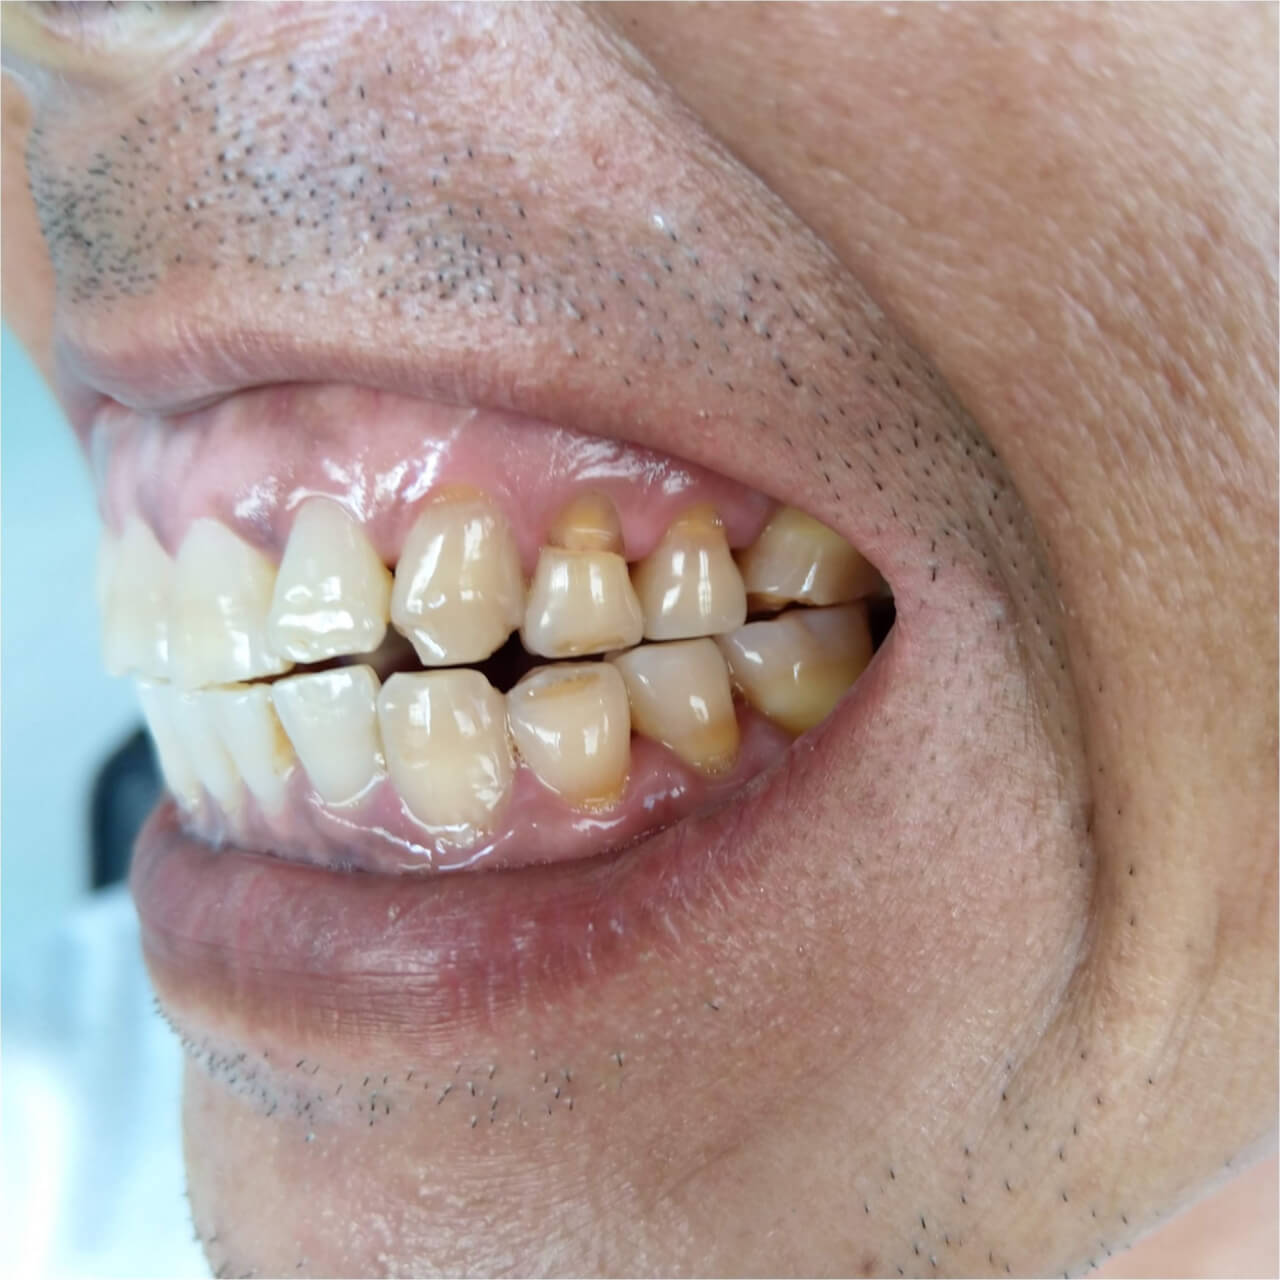 tooth erosion at gum line